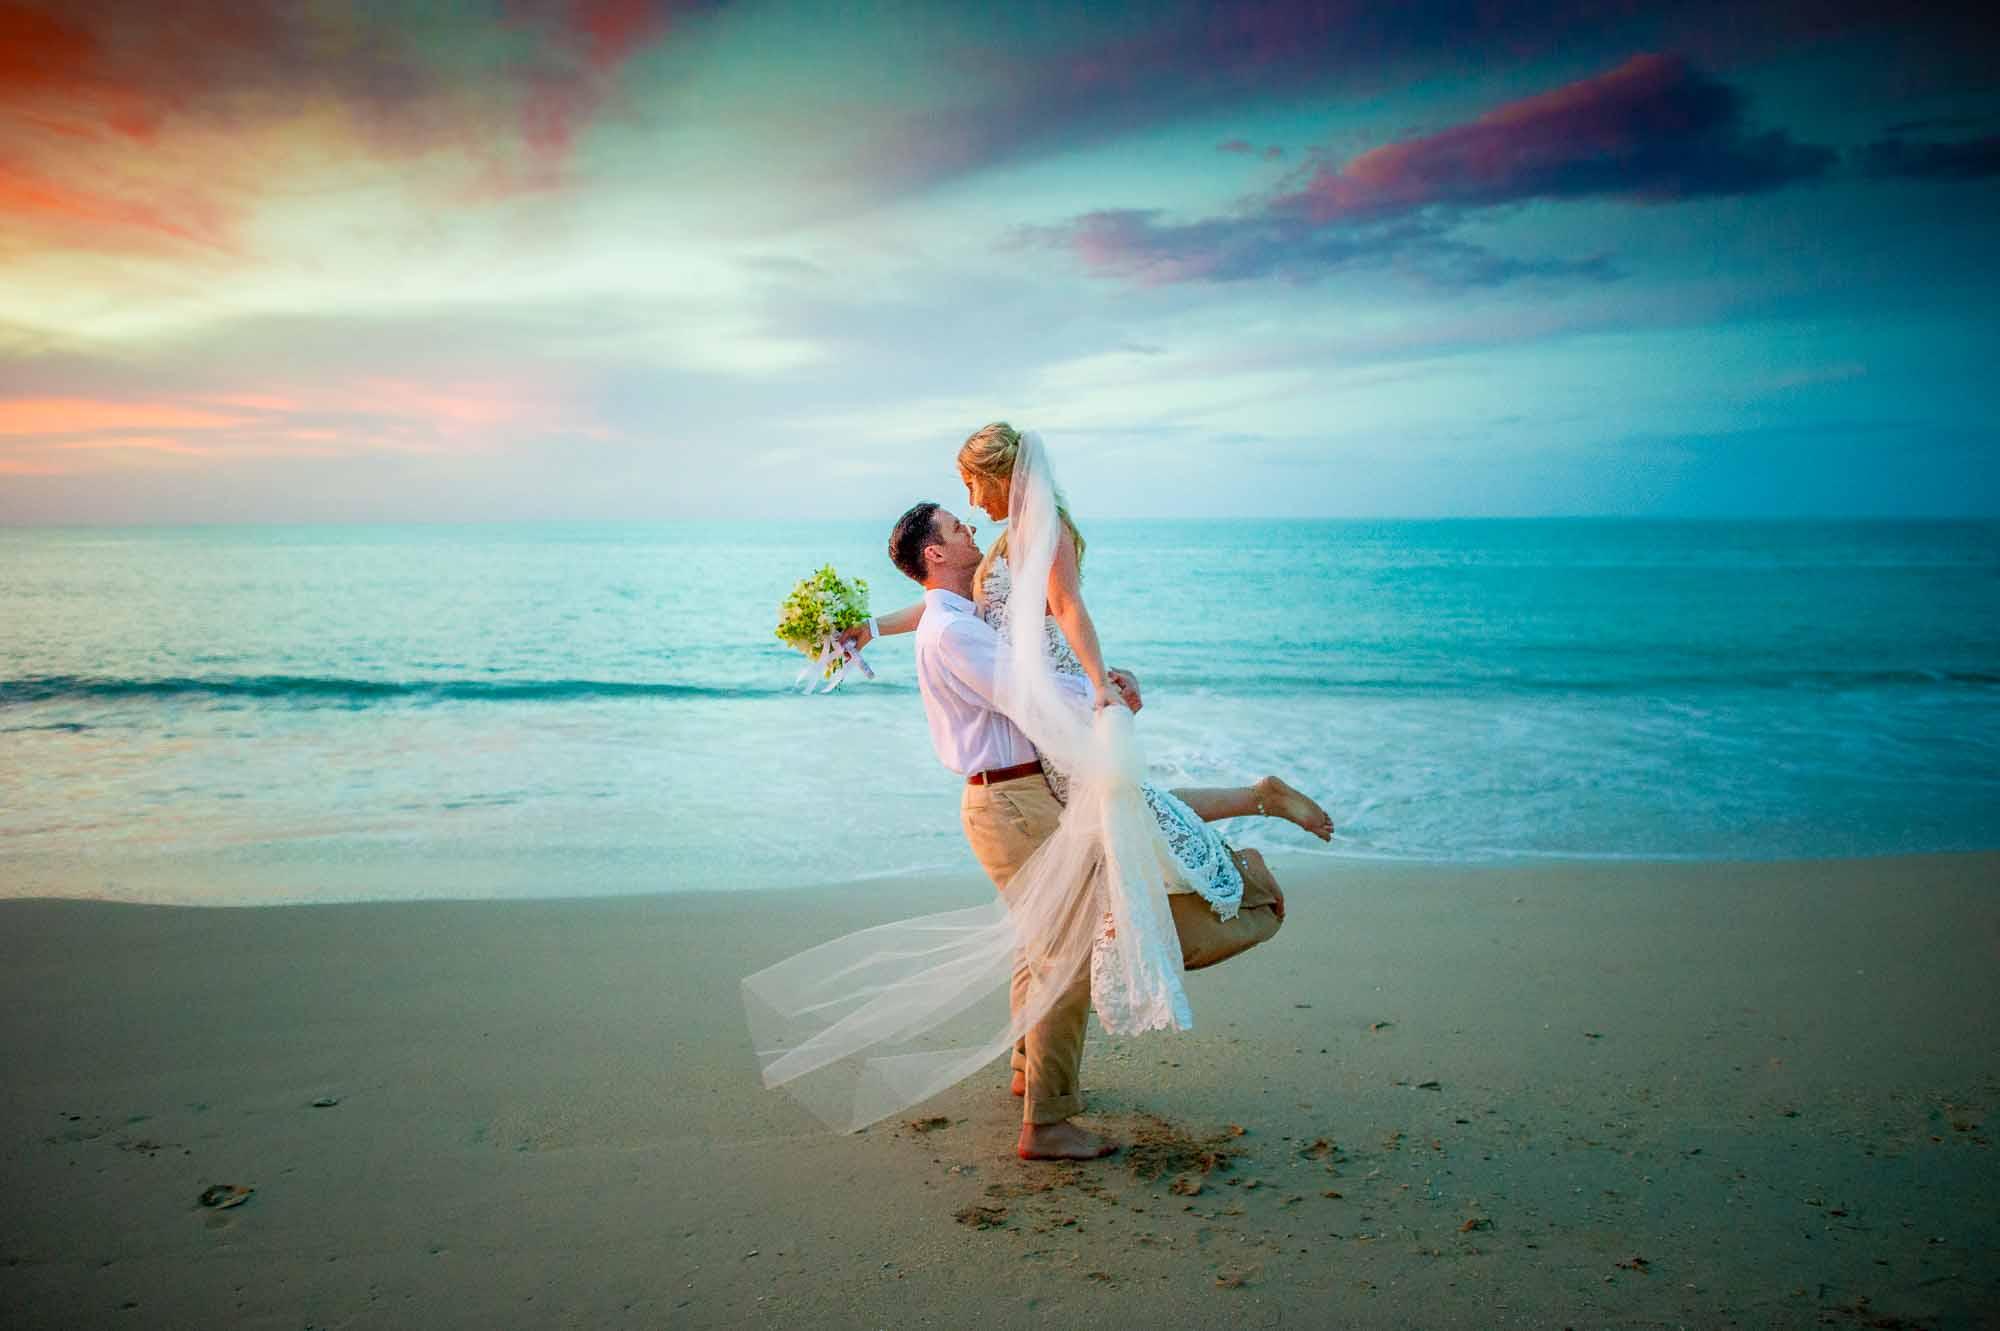 Testimonial - Rickie & Peter - Wedding couple from Australia